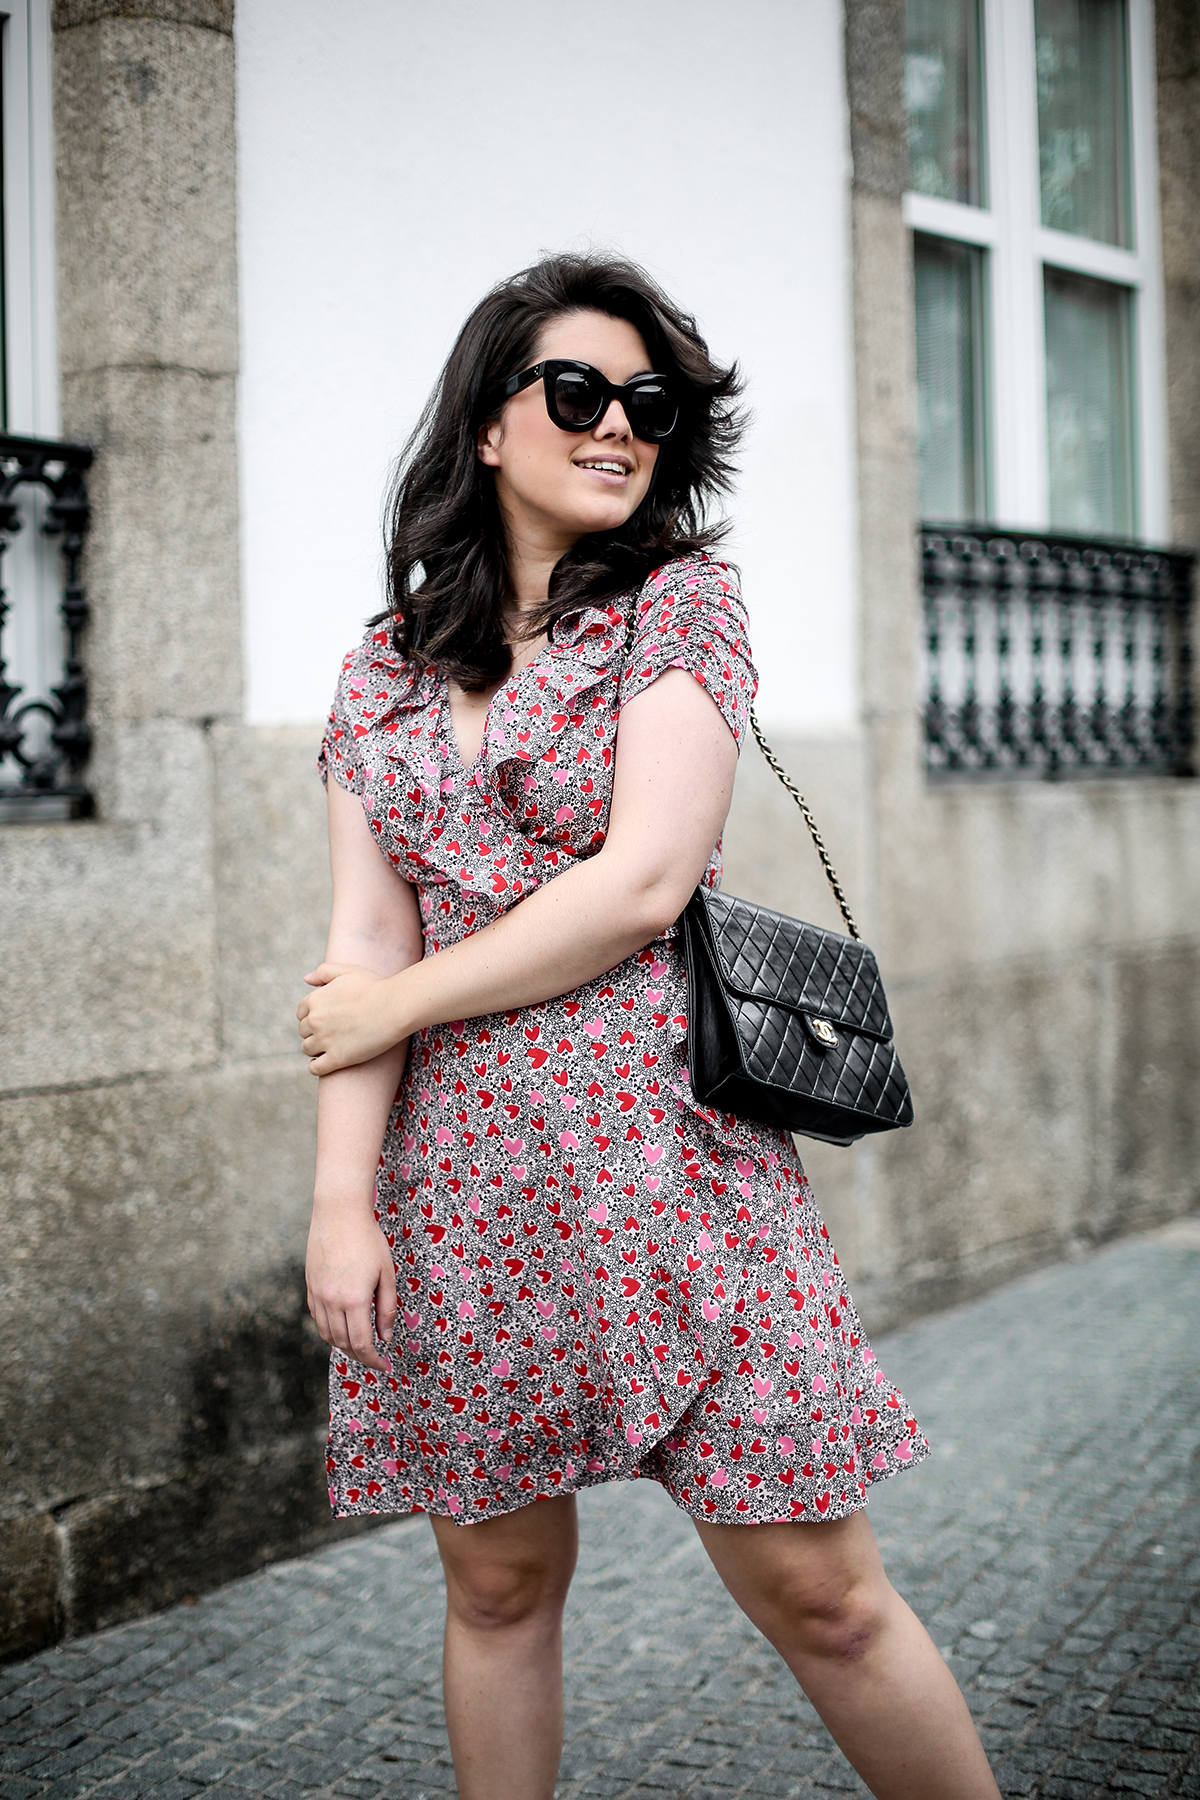 vestido-volantes-cruzado-joanie-clothing-chanel-vintage-alpargatas-shop-cherie10